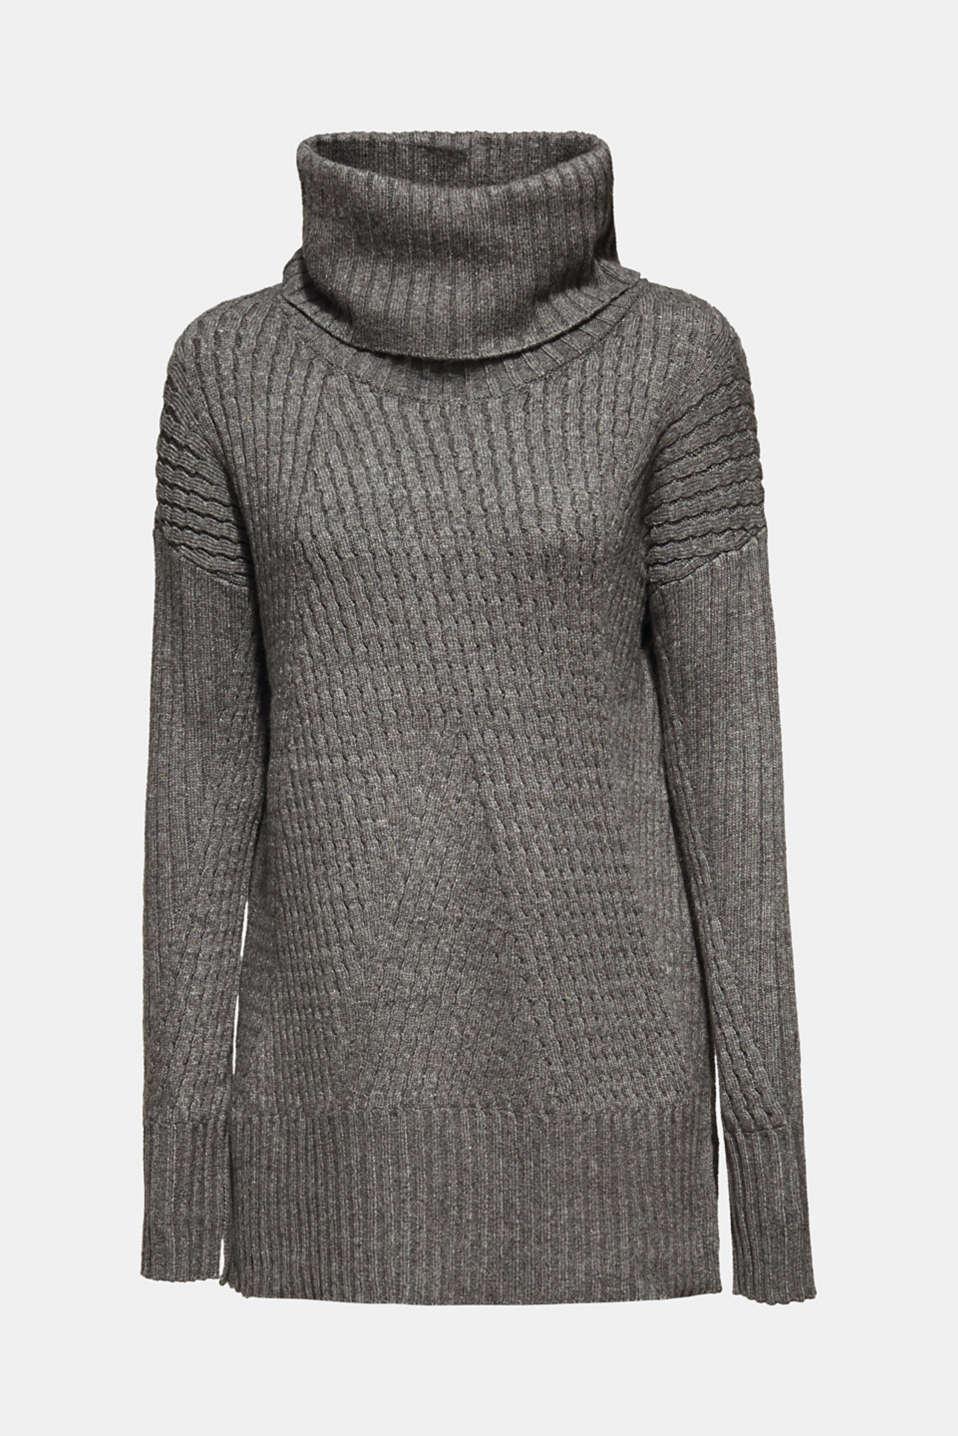 Sweaters, GUNMETAL 5, detail image number 7